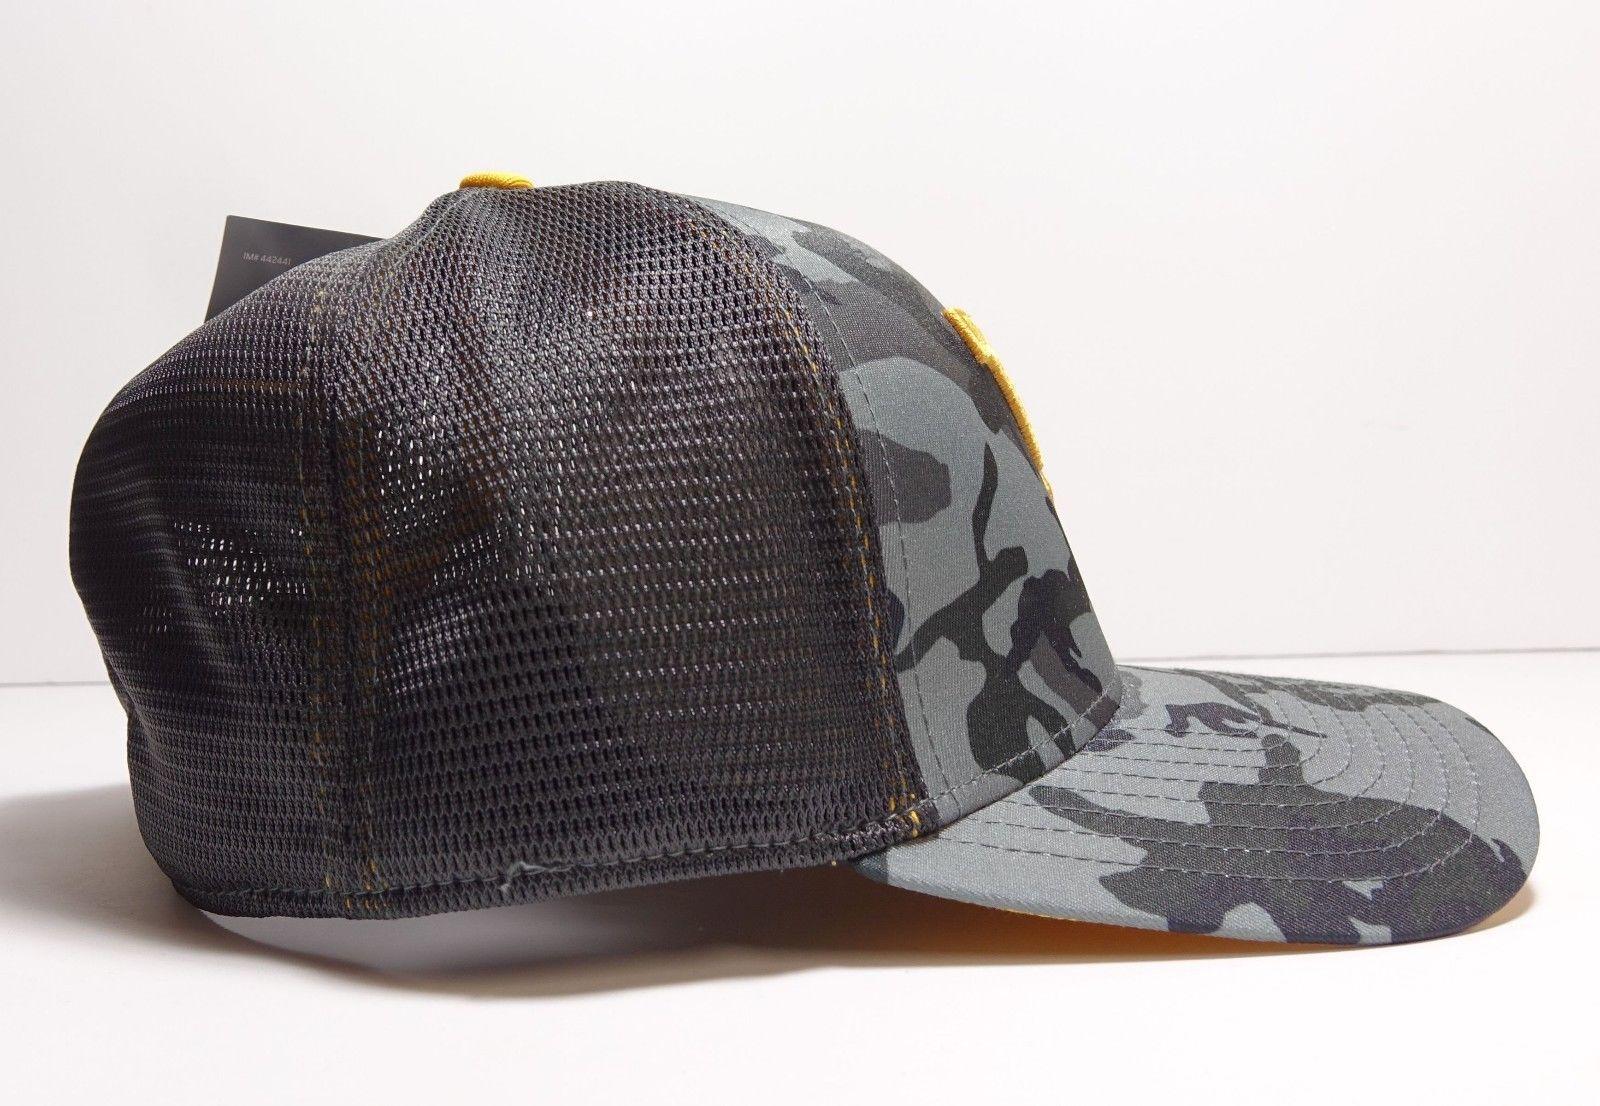 Nike West Virginia Mountaineers Gray Black Camo Swooshflex Hat One Size New